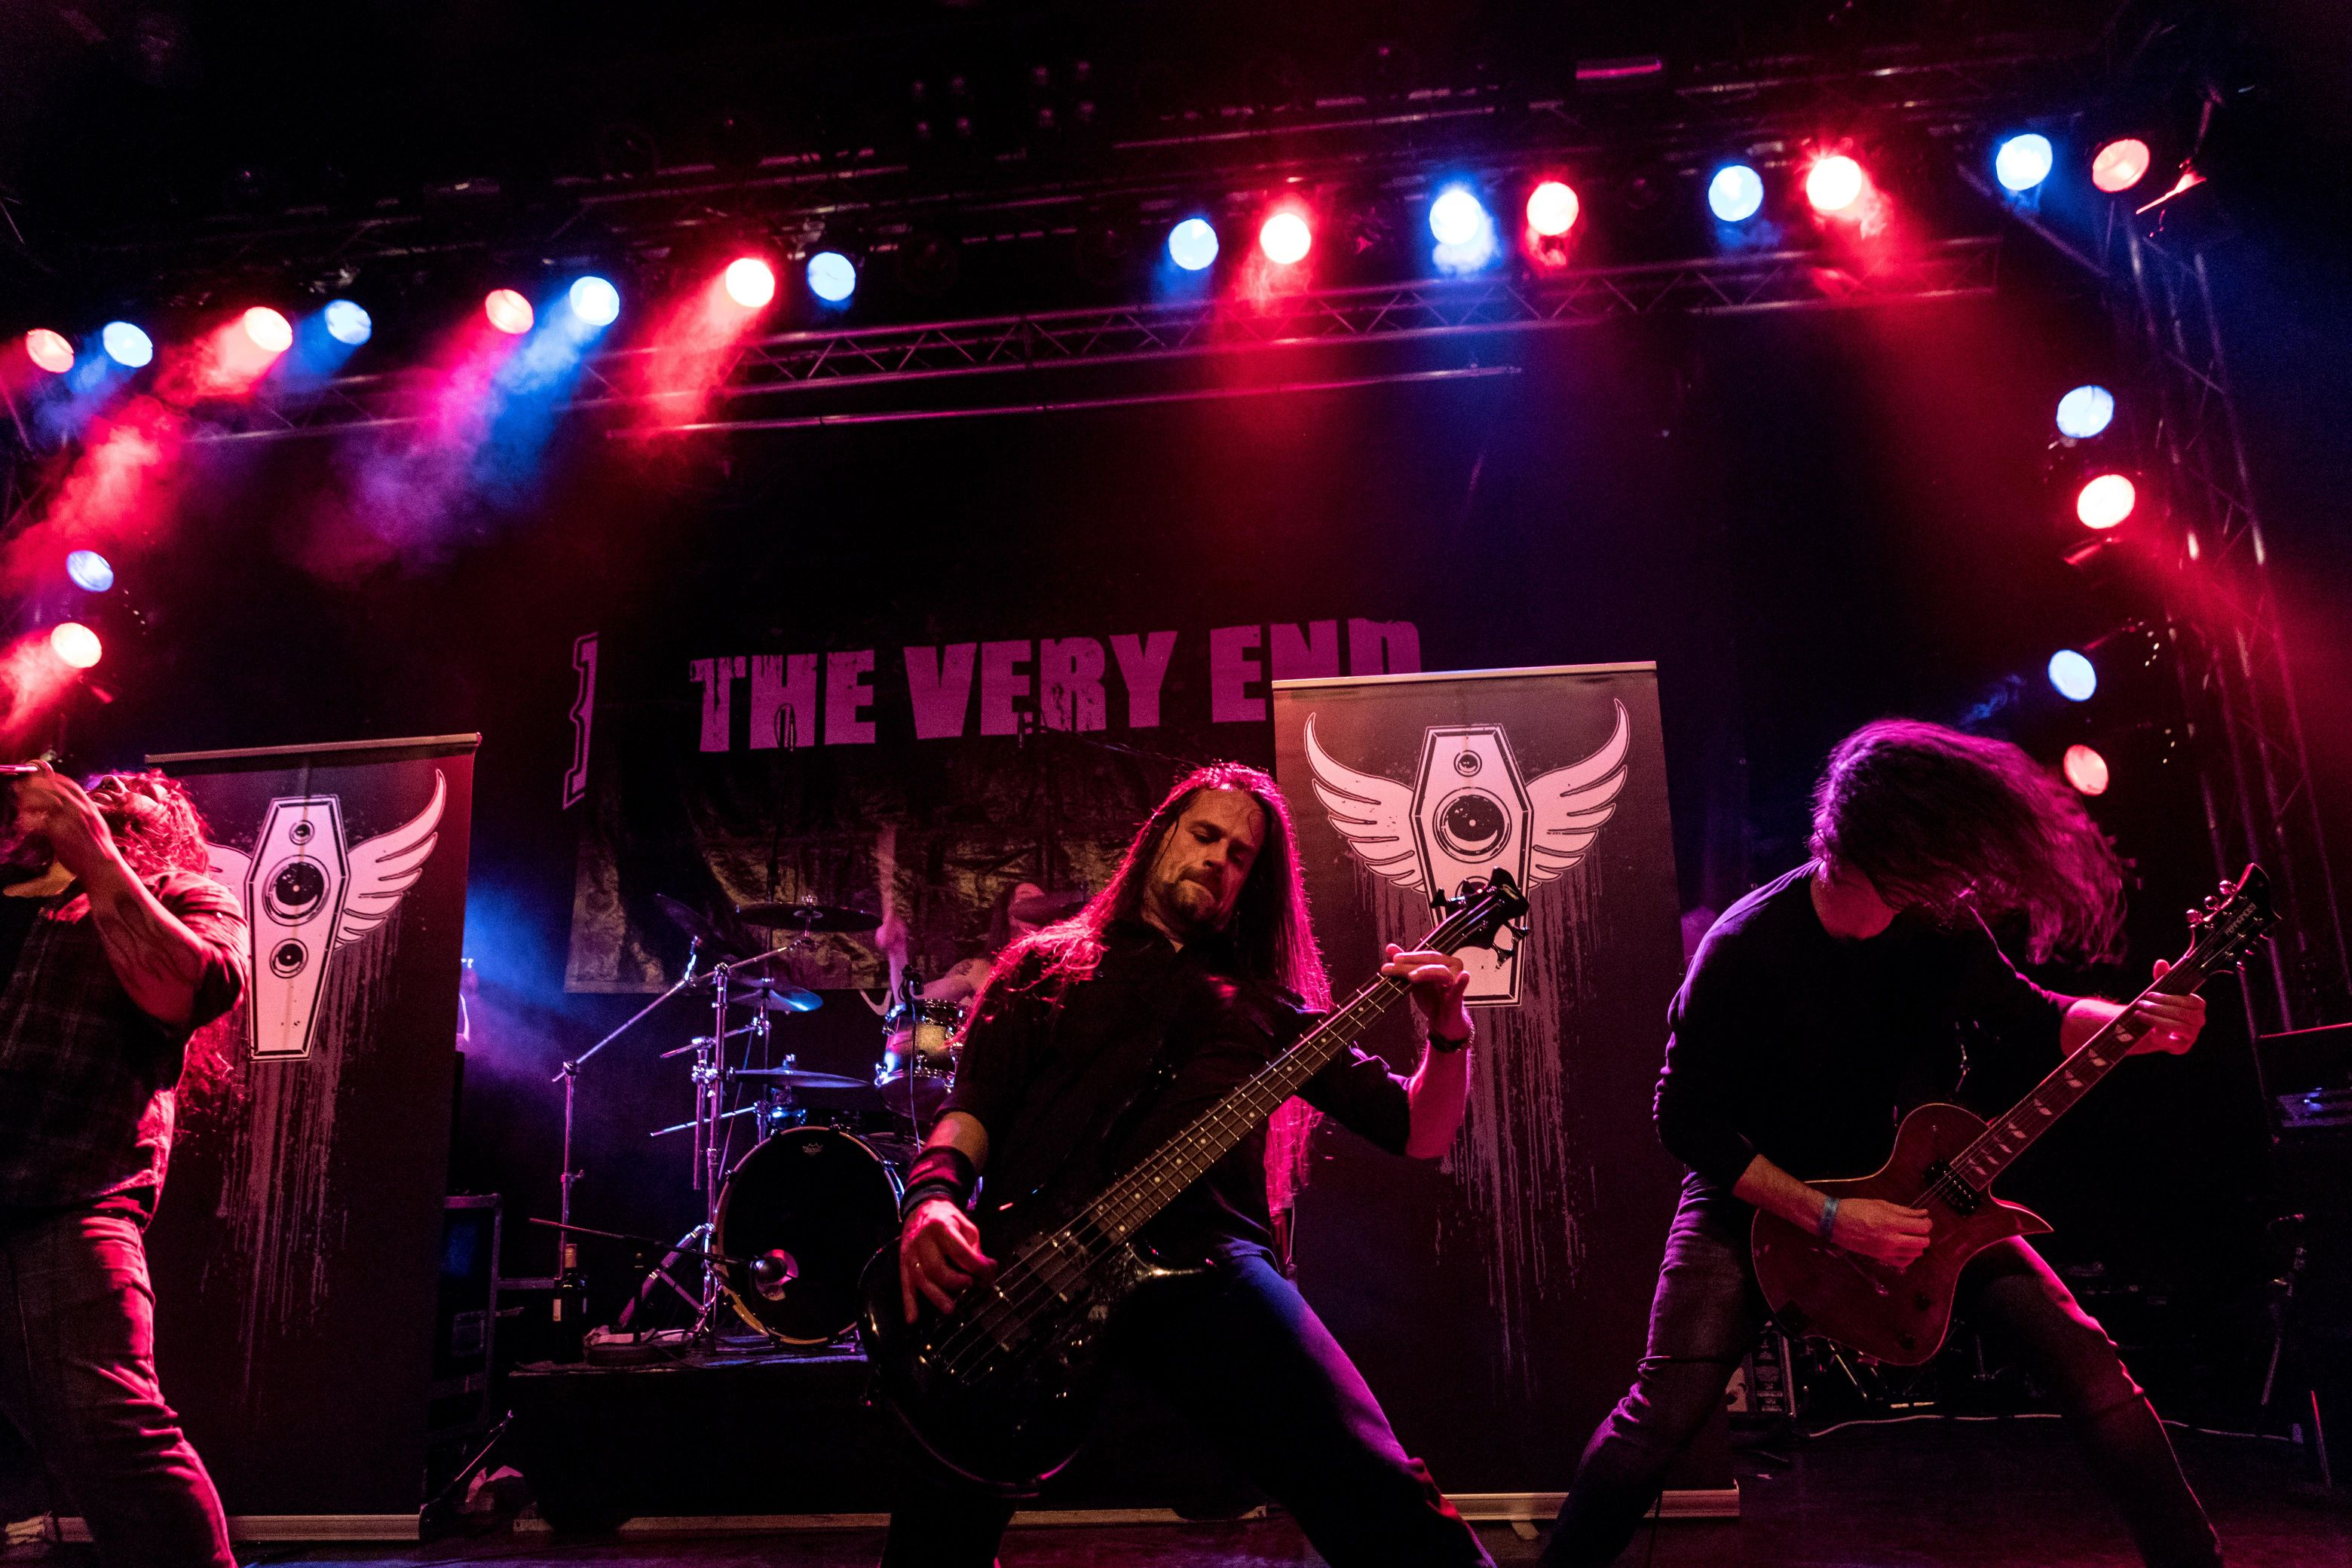 the-very-end-live-zeche-carl-essen-germany-thrash-metal